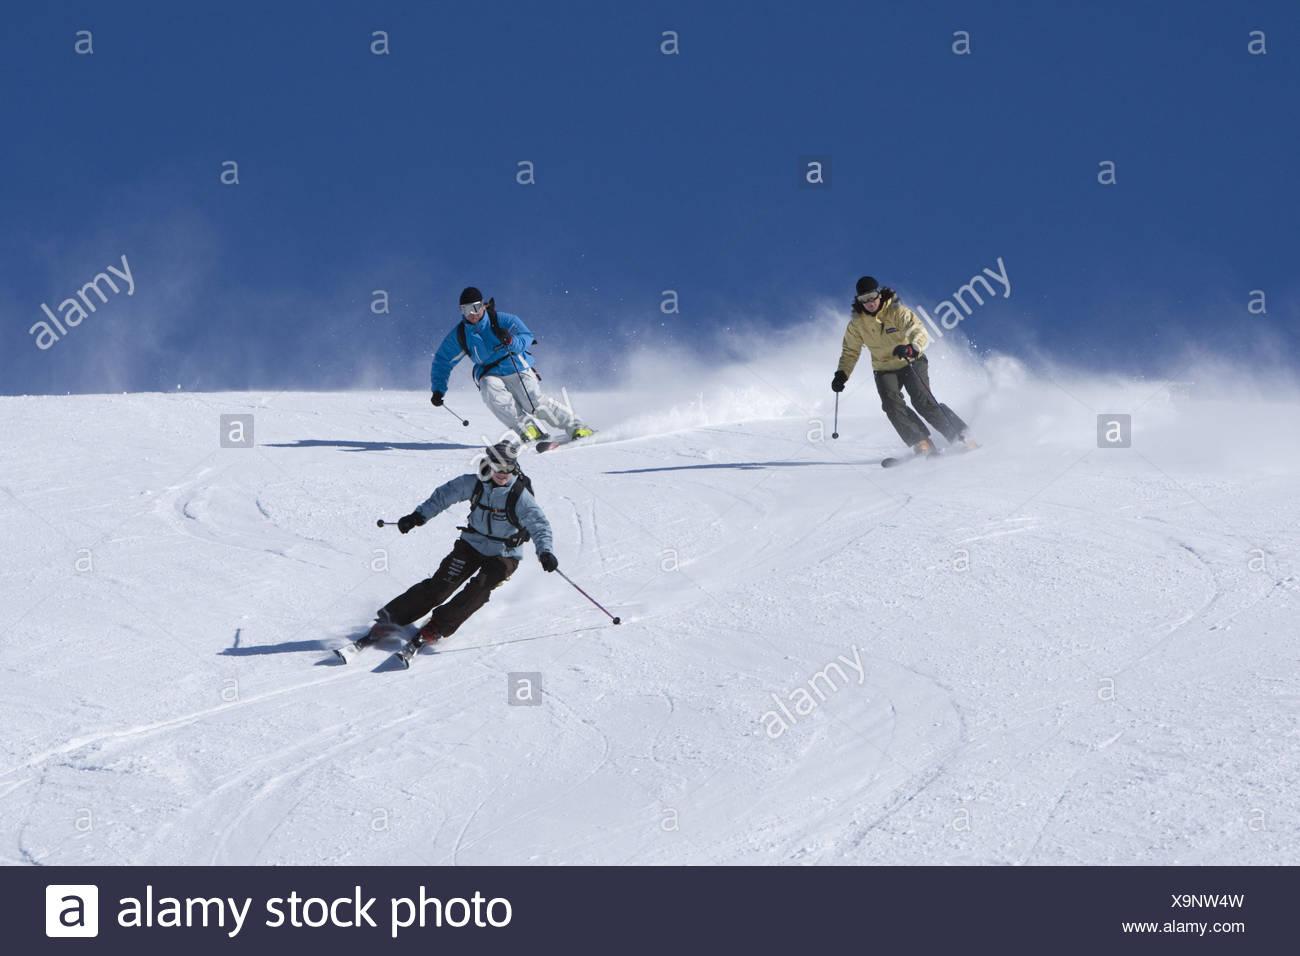 Switzerland, the Engadine, Bernina group, Diavolezza, skiing area, runway, skier, three, - Stock Image